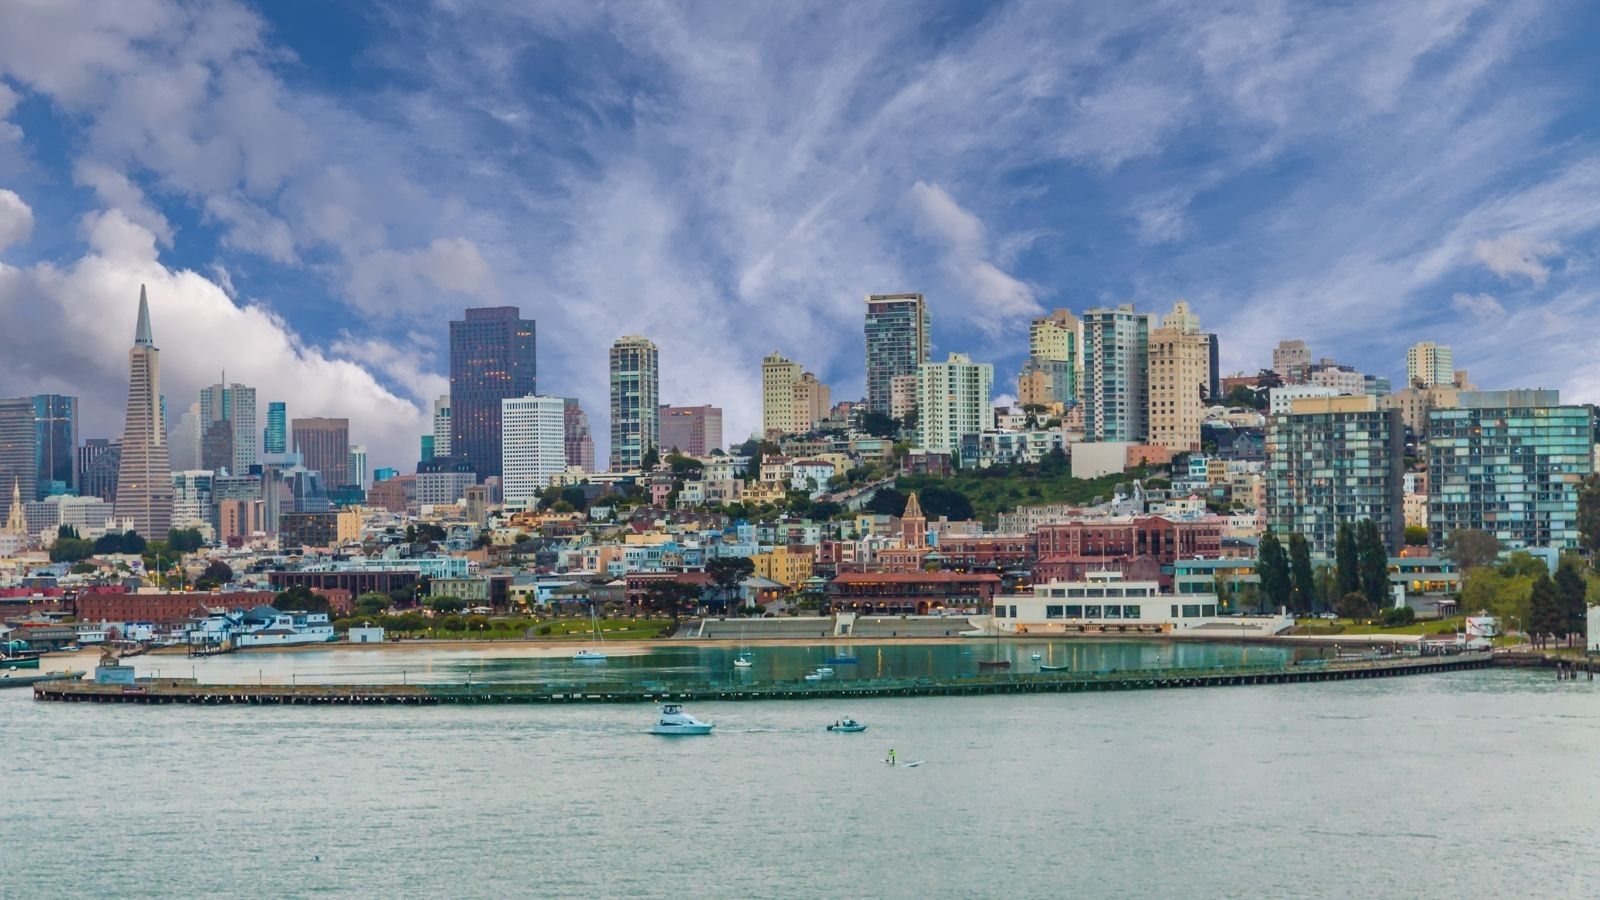 Frisco Real Estate Market Report - This June 2021